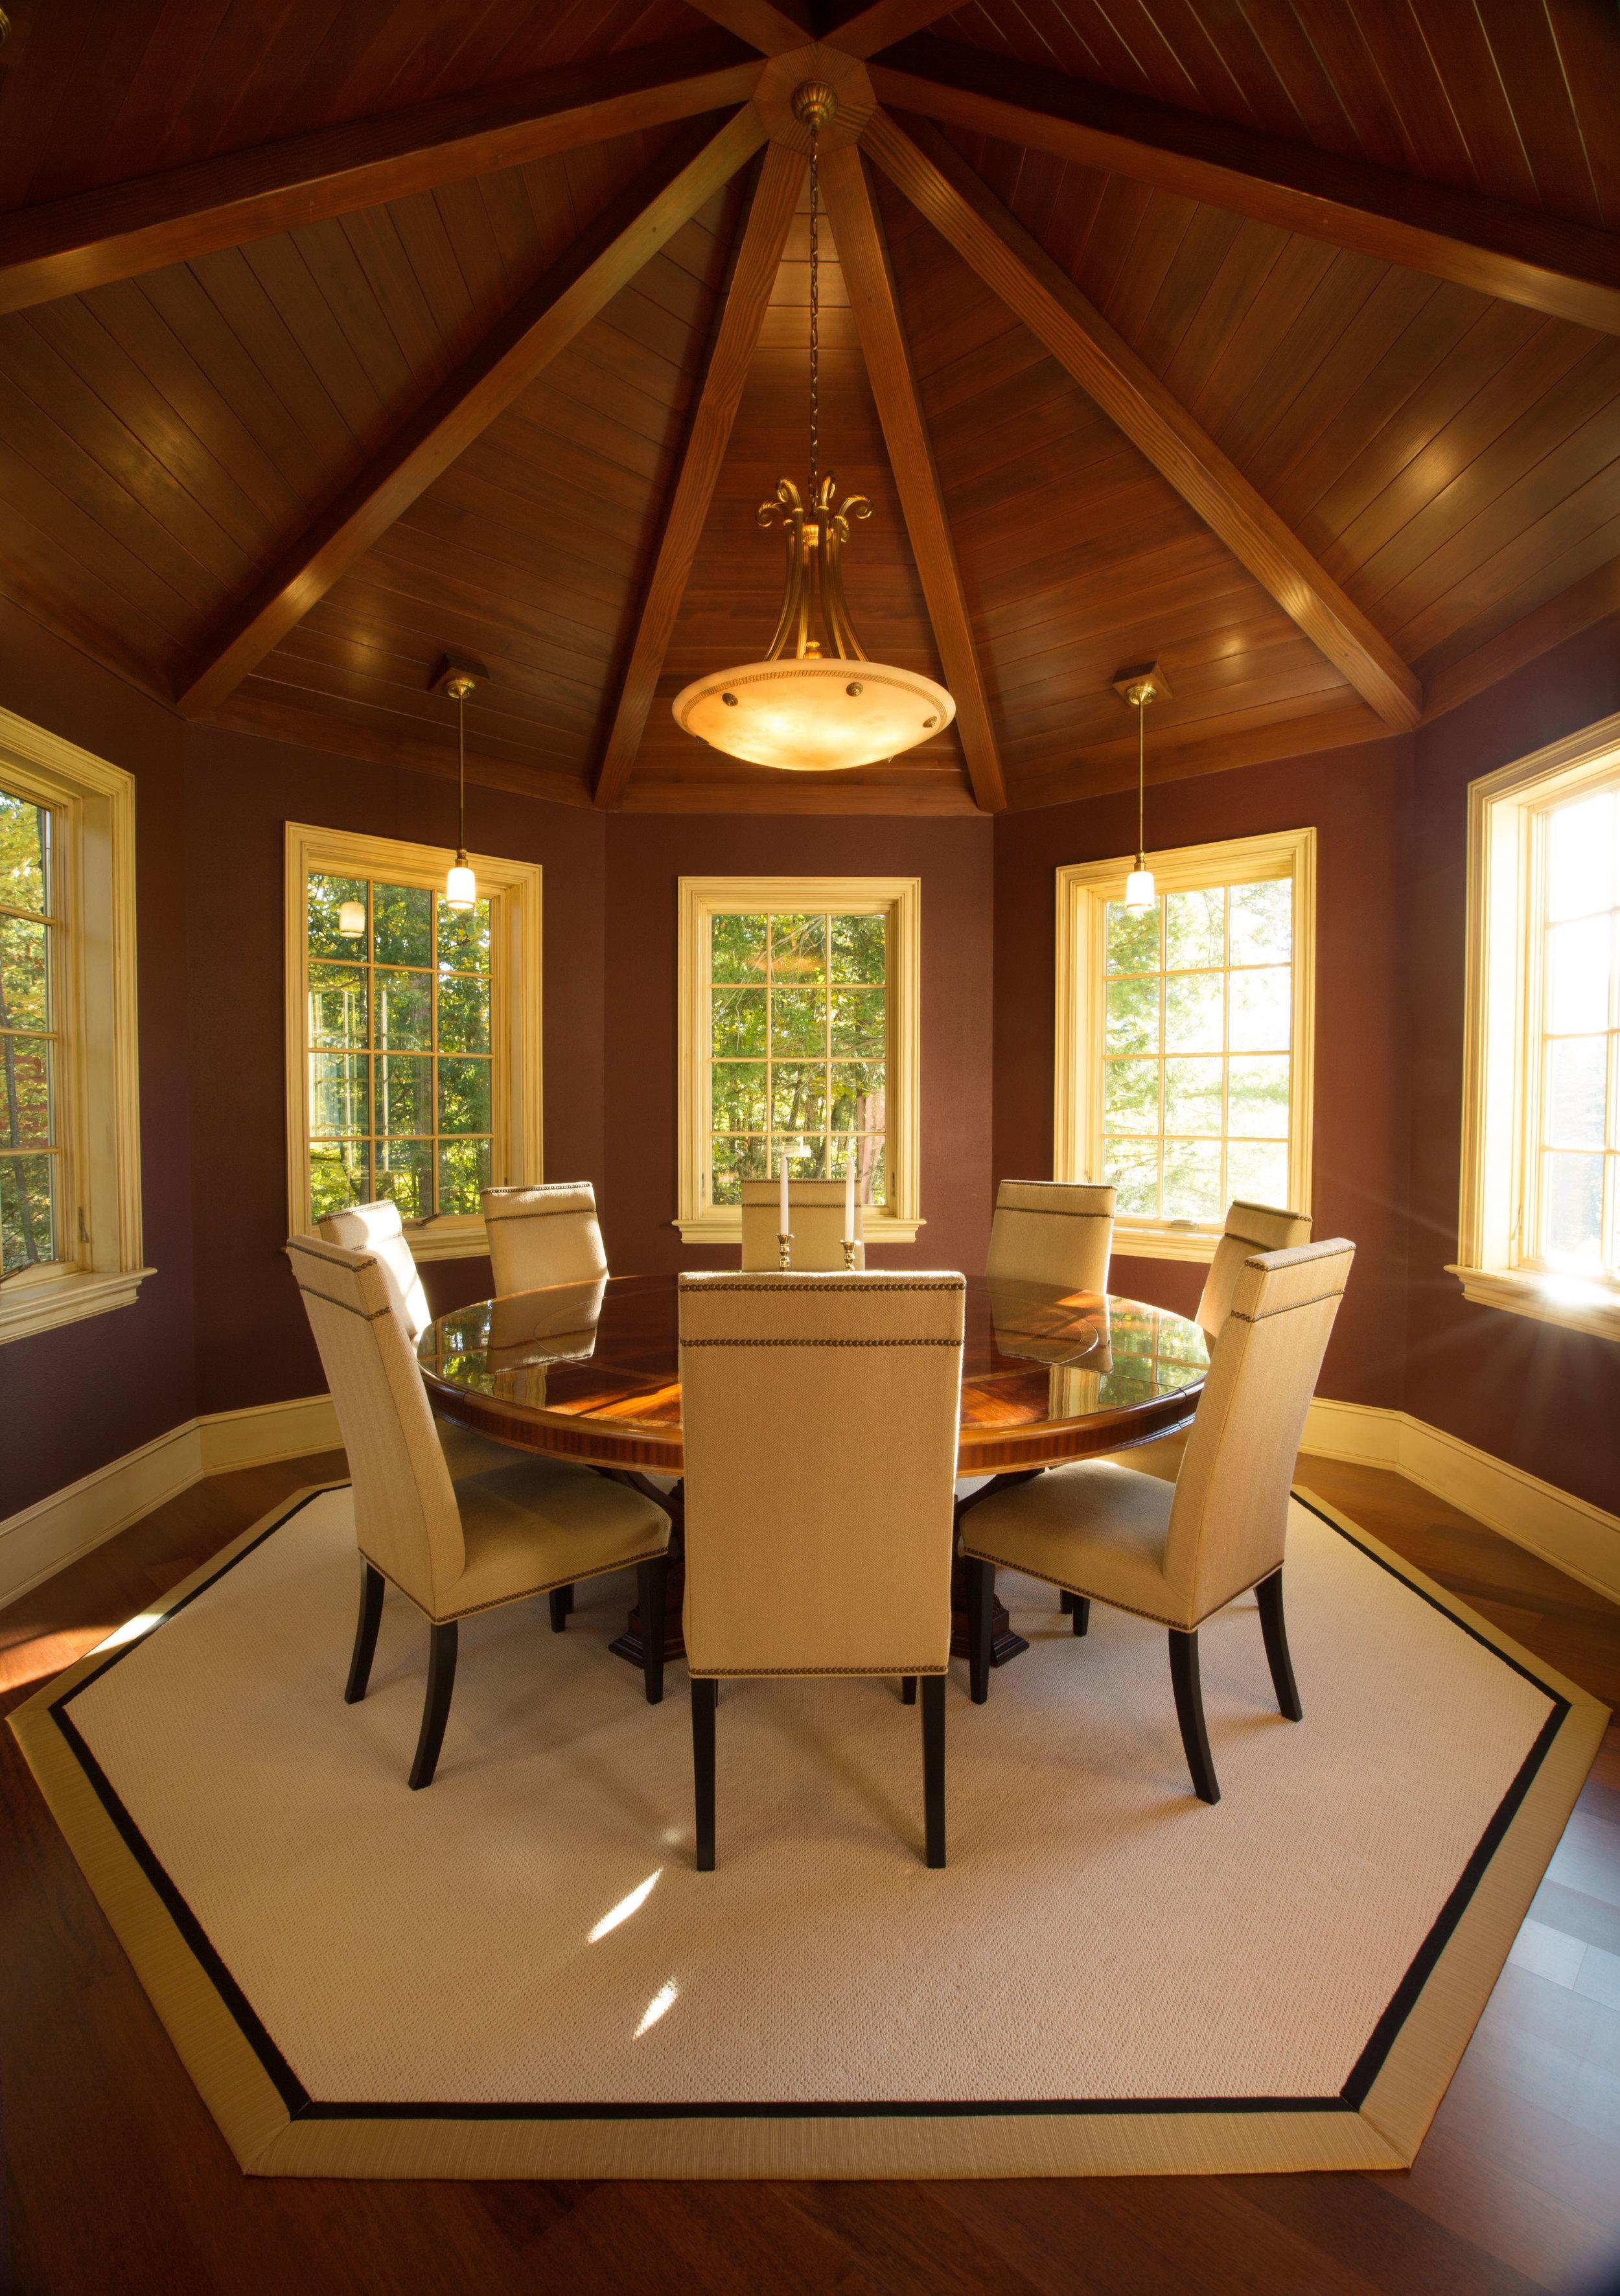 Corcoran-Dining Room 3 (img2120).jpg